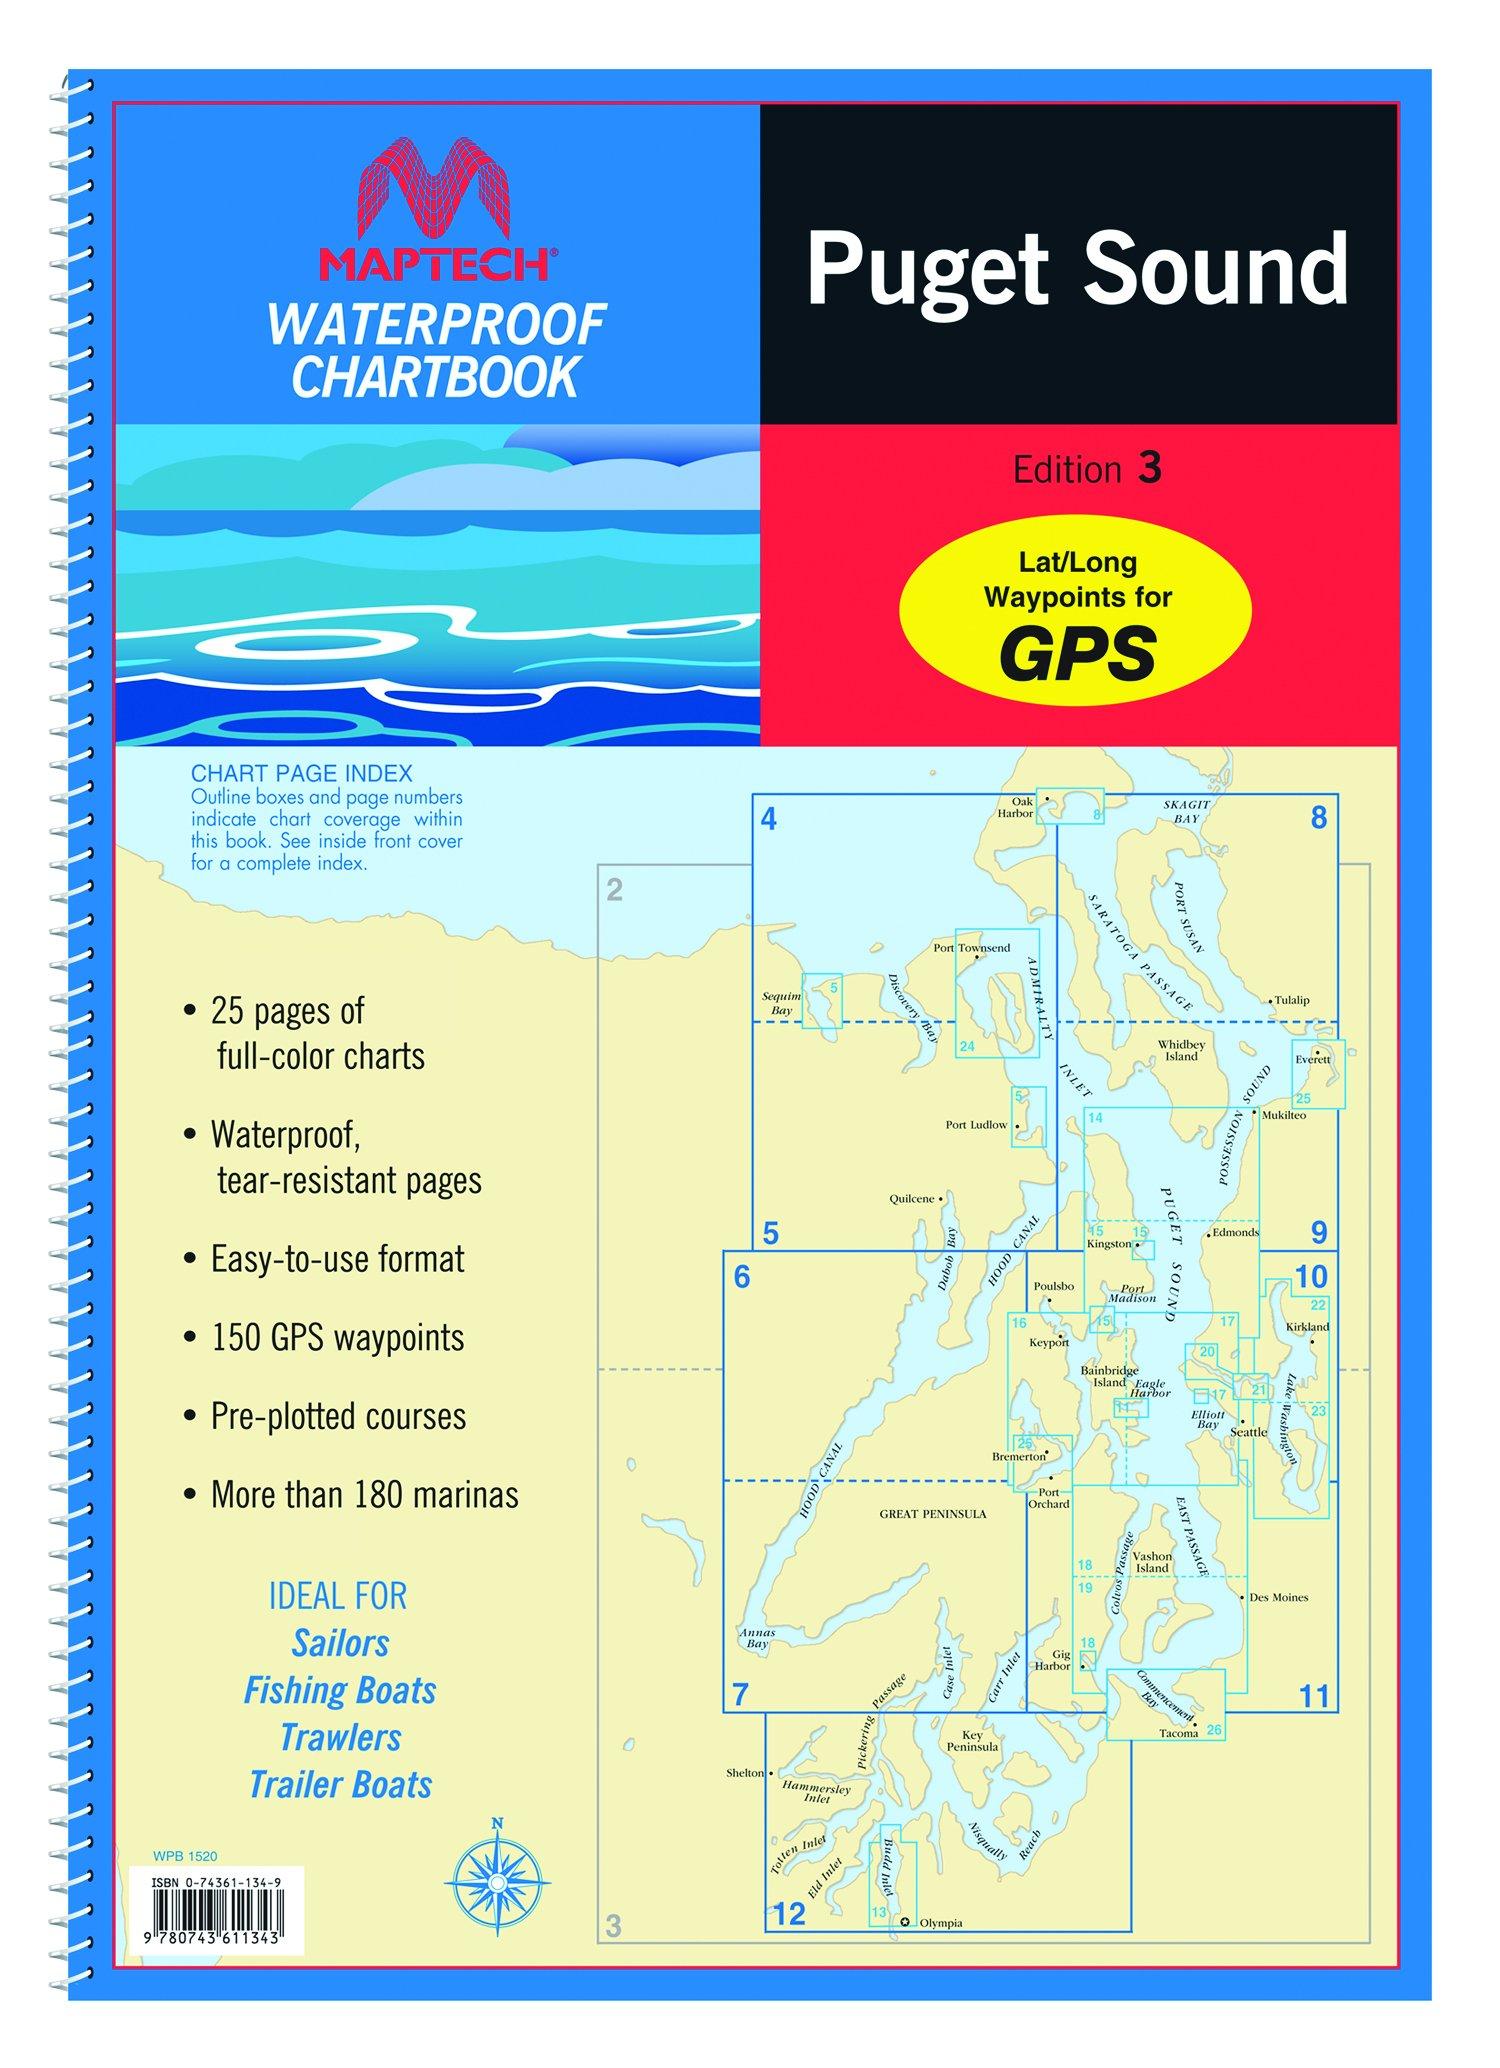 Maptech Puget Sound Waterproof Chartbook 3rd Edition